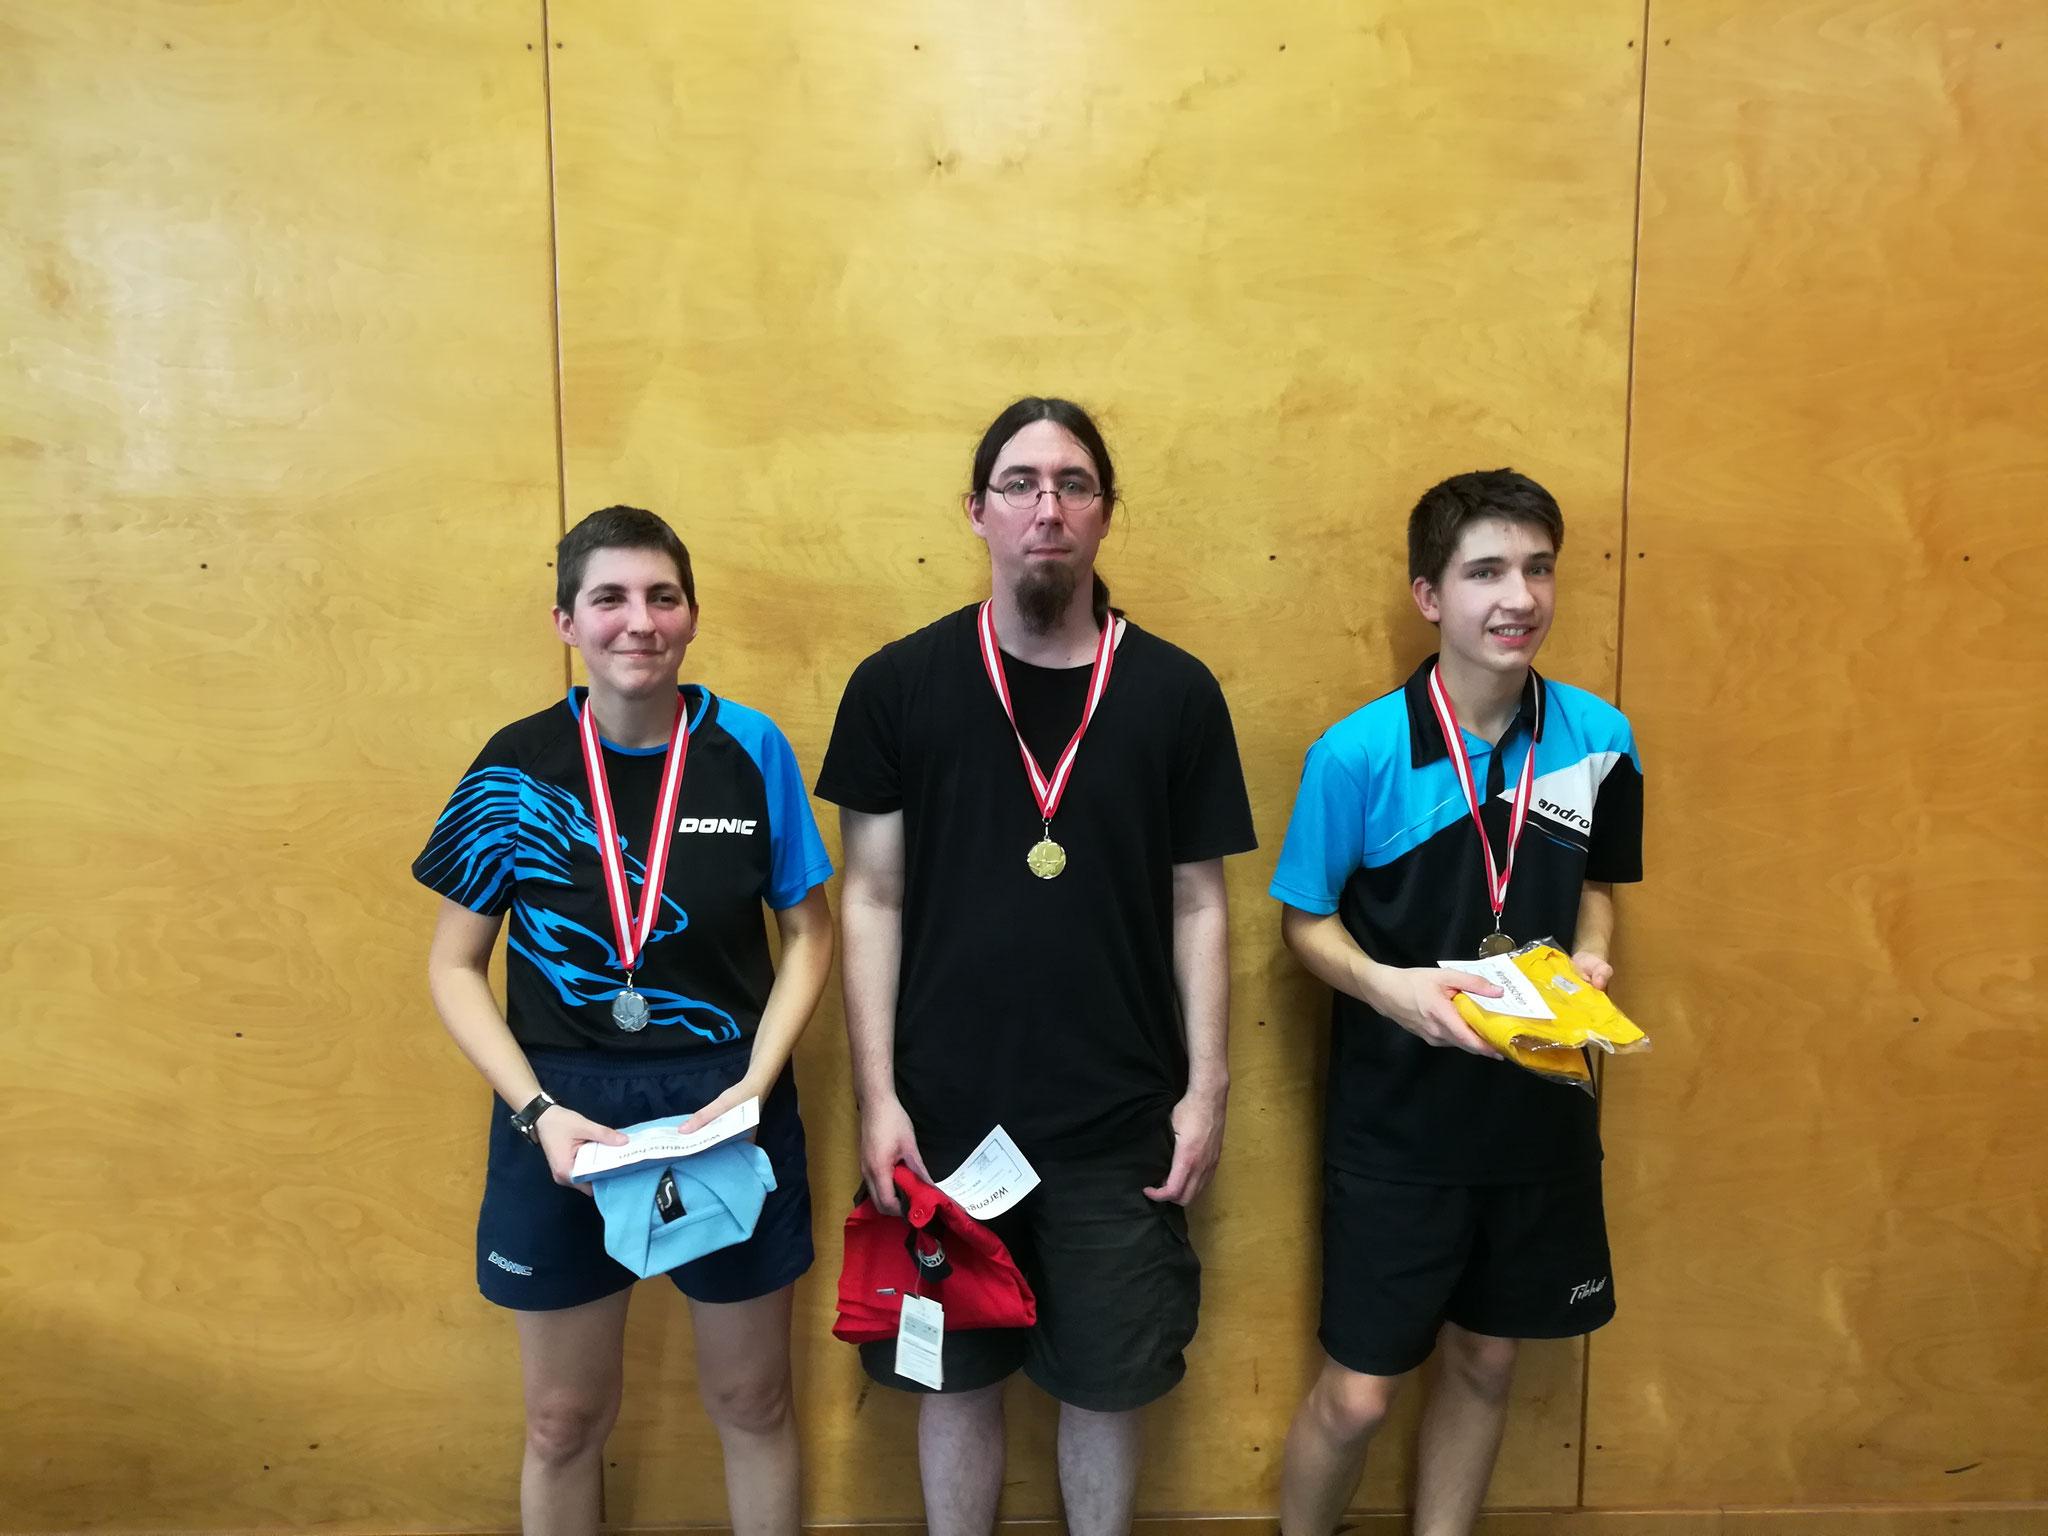 Siegerfoto Bewerb F: v.l.n.r. Lucia Lesayova (WIES) (Platz 2), Michael Müller (Sieger), Sebastian Auer (SIER) (Platz 3)